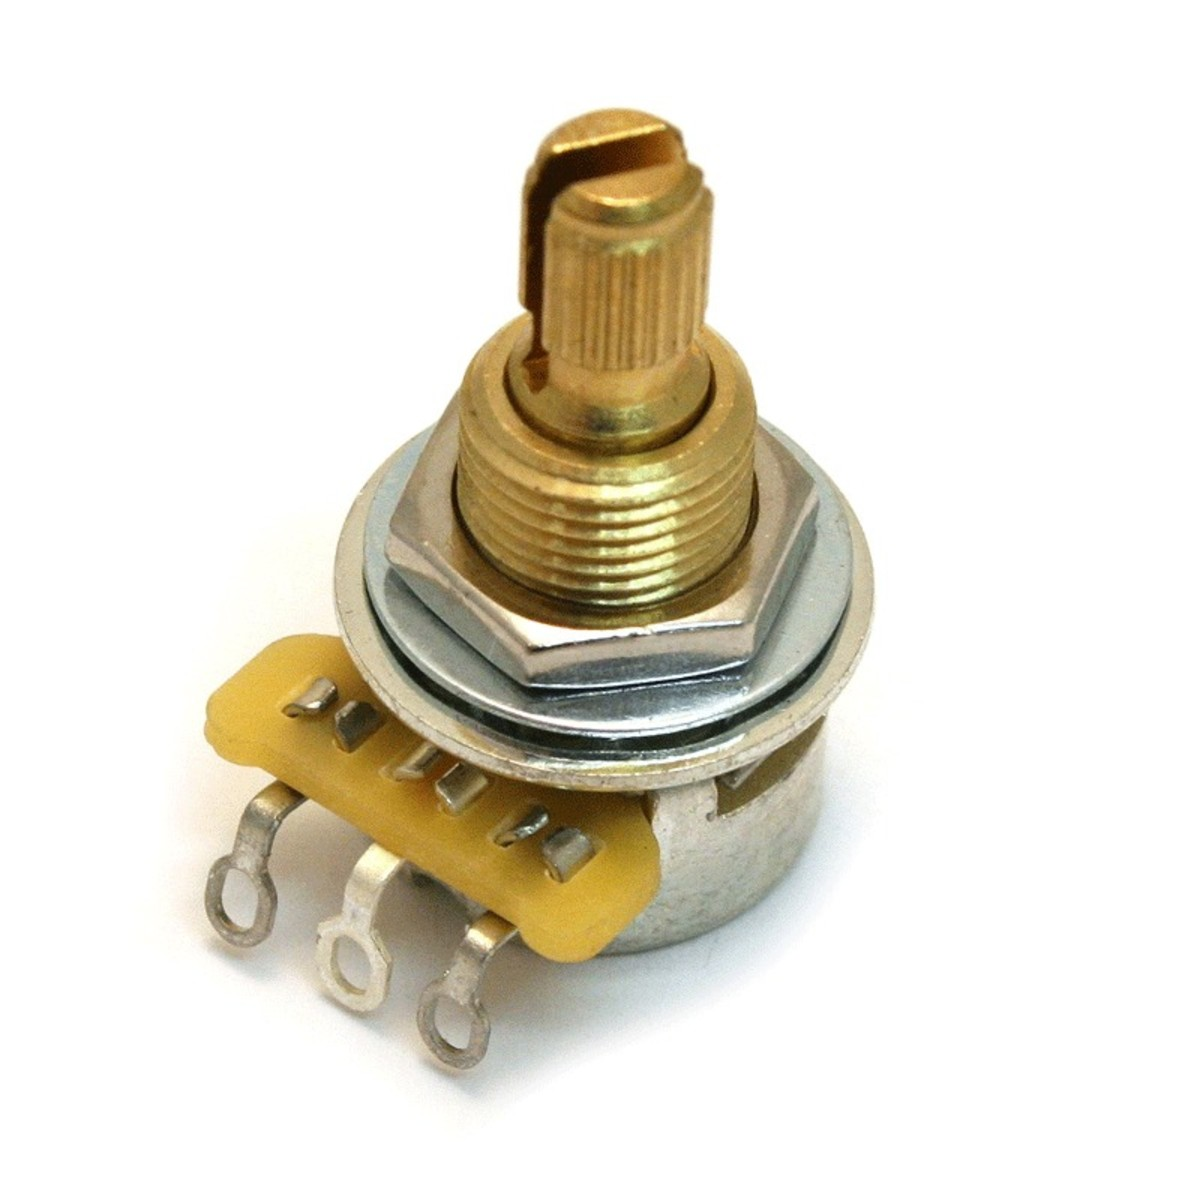 Image of CTS EP-5485-000 250K Mini Log. Split Shaft Potentiometer